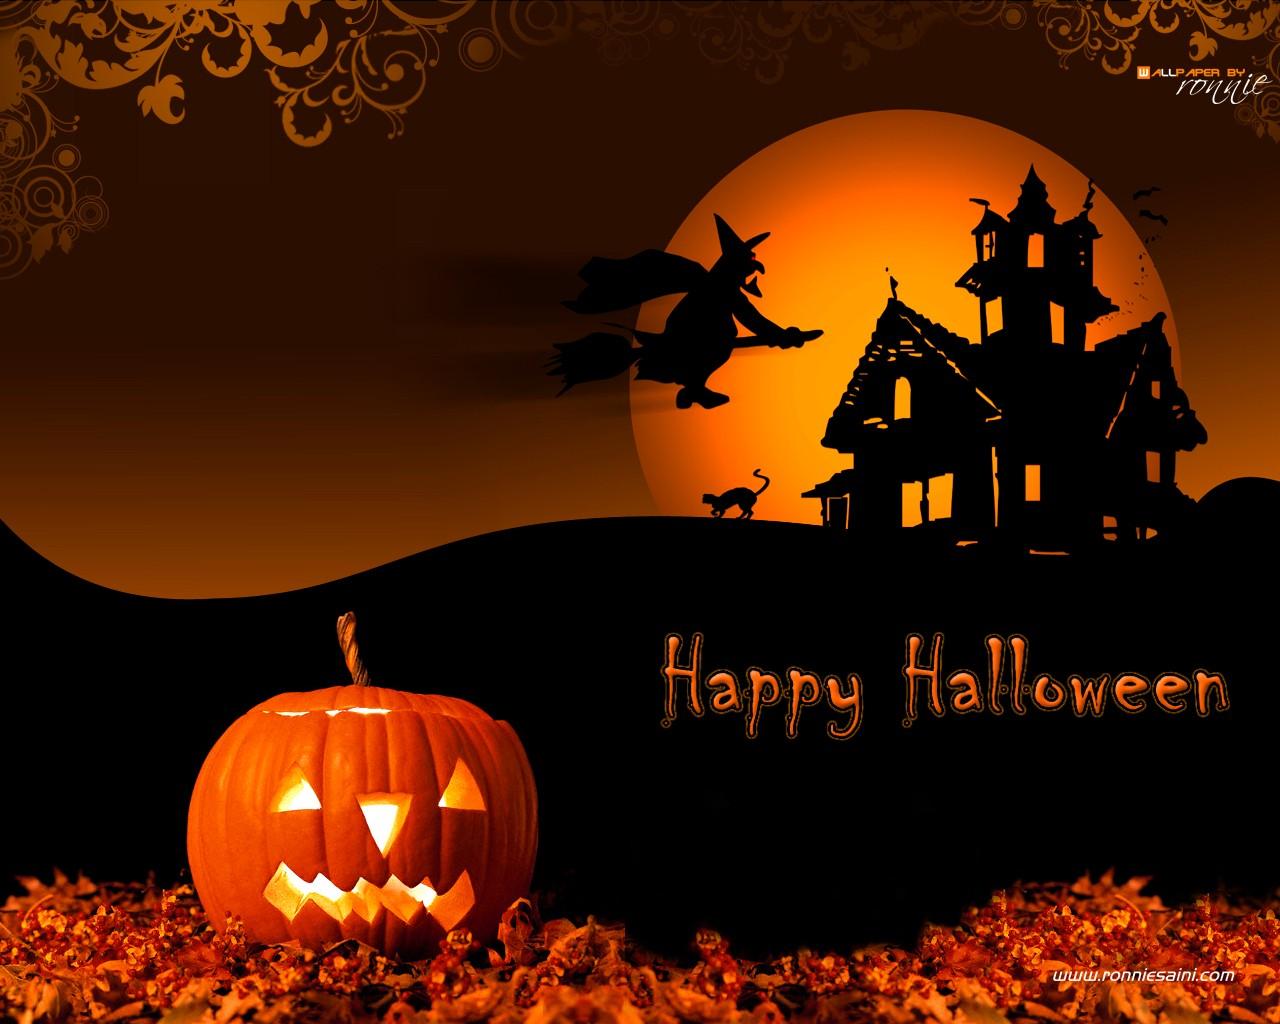 Halloween wallpaper 1280x1024 47133 1280x1024